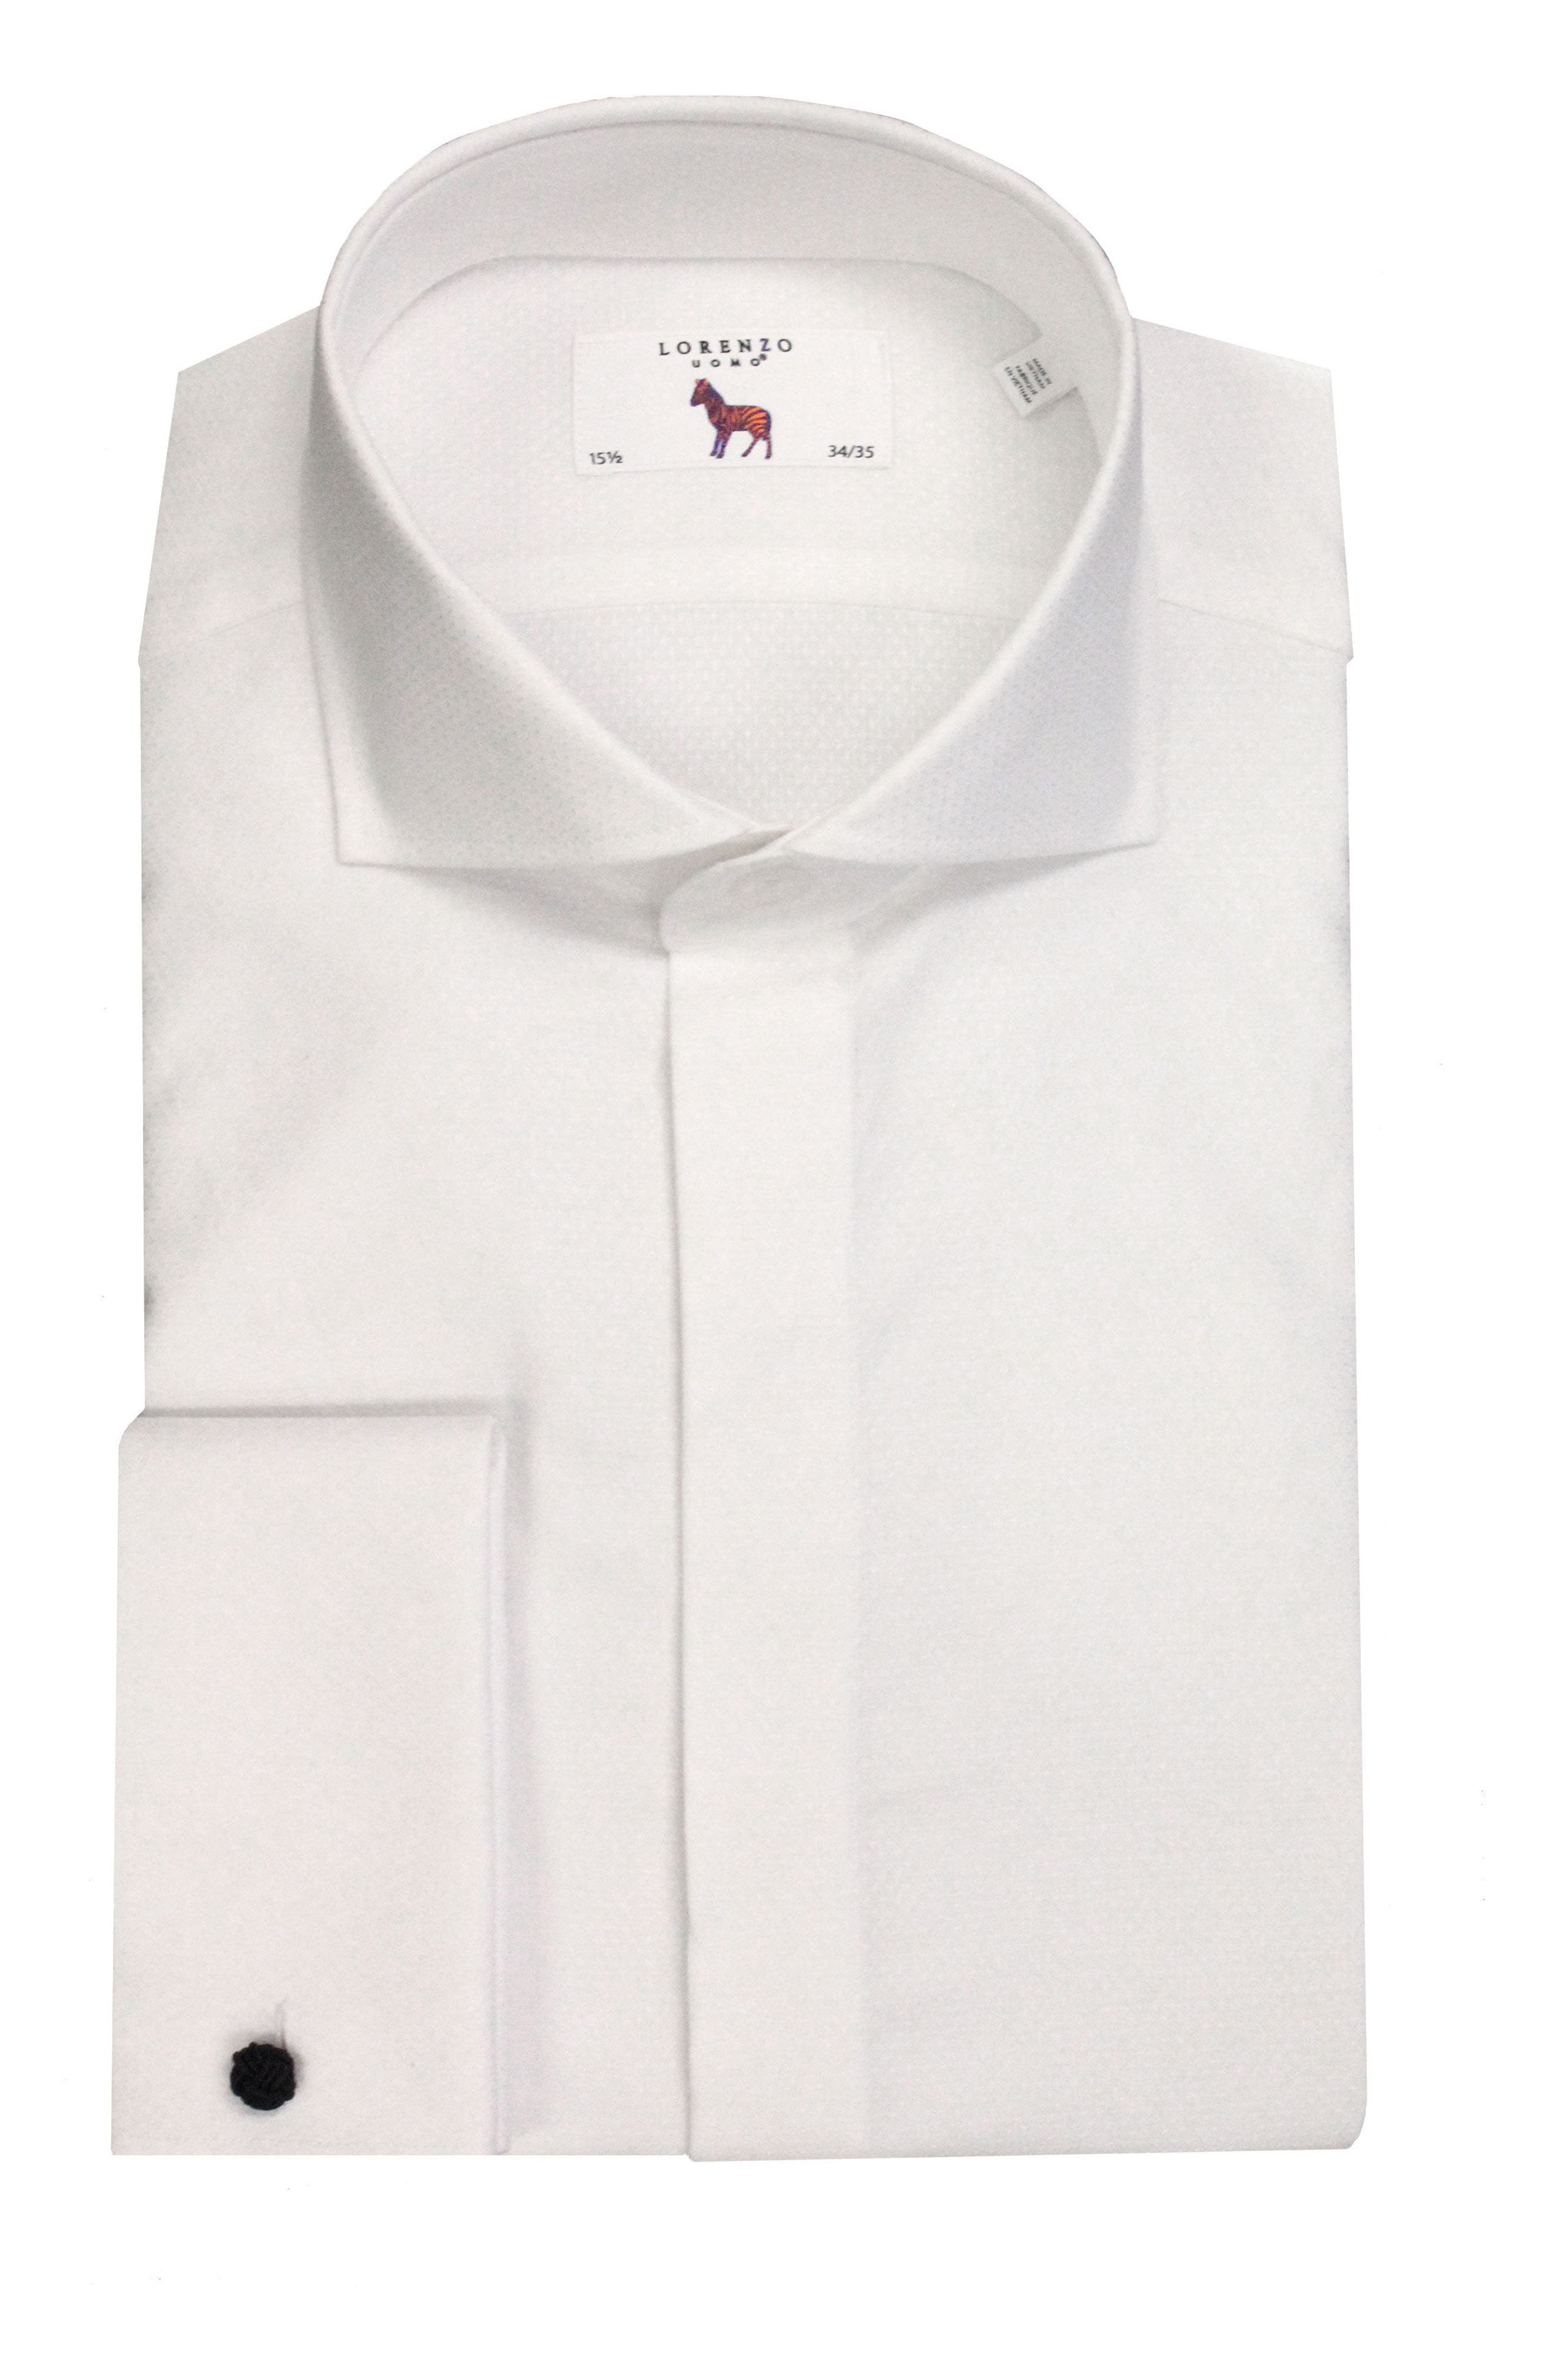 Lorenzo Uomo Trim Fit Tuxedo Shirt